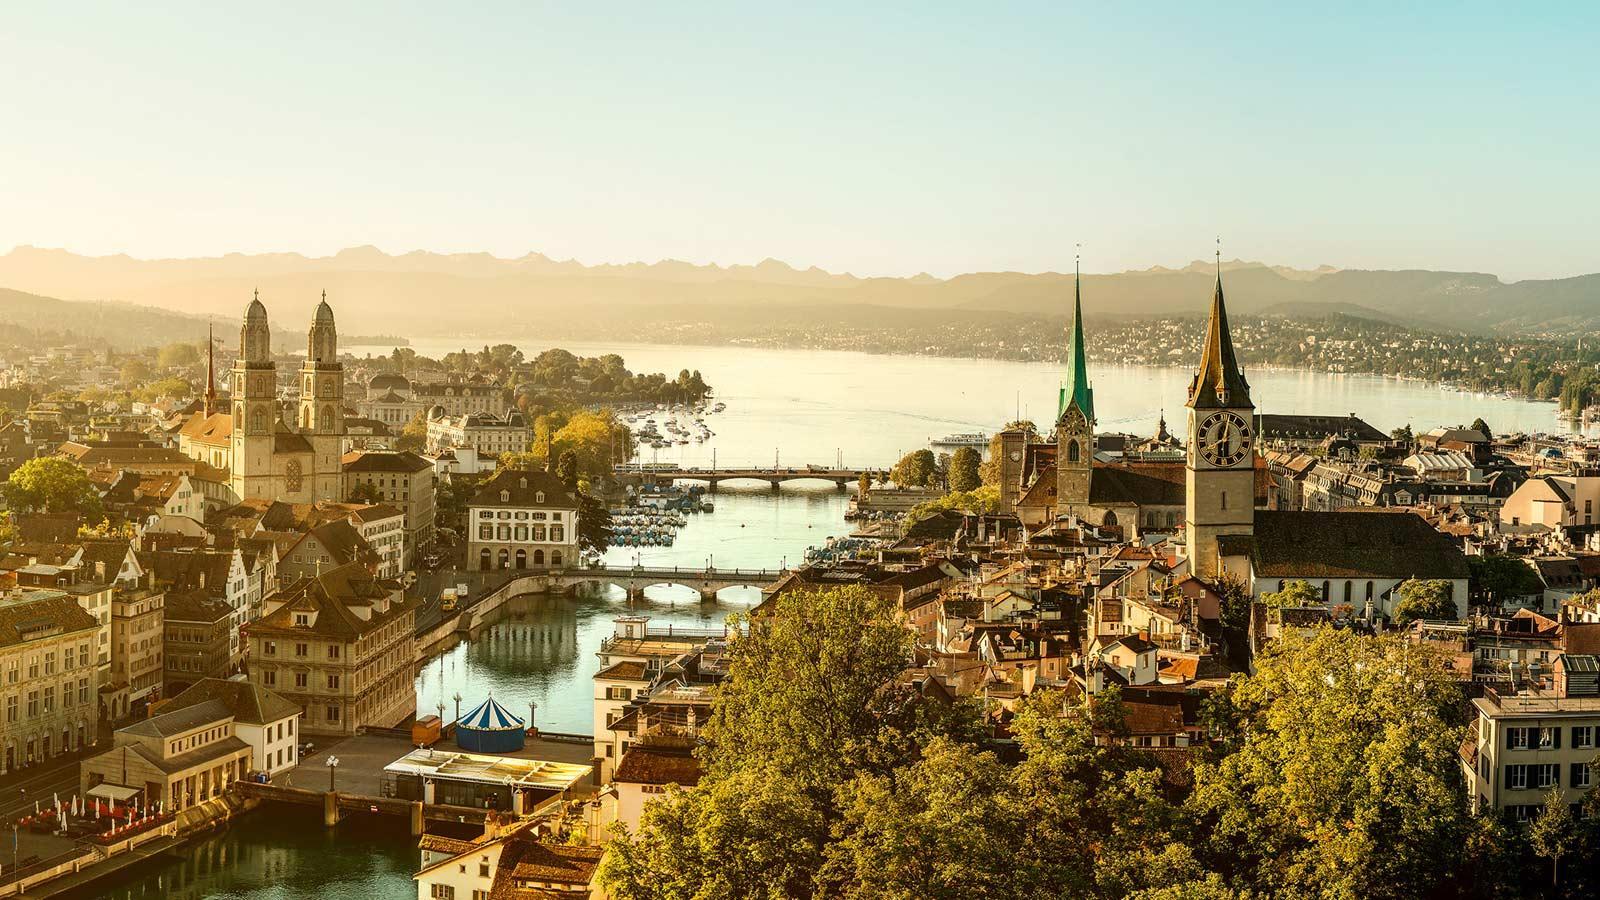 Mergers & Acquisitions Quarterly Switzerland - Fourth Quarter 2010